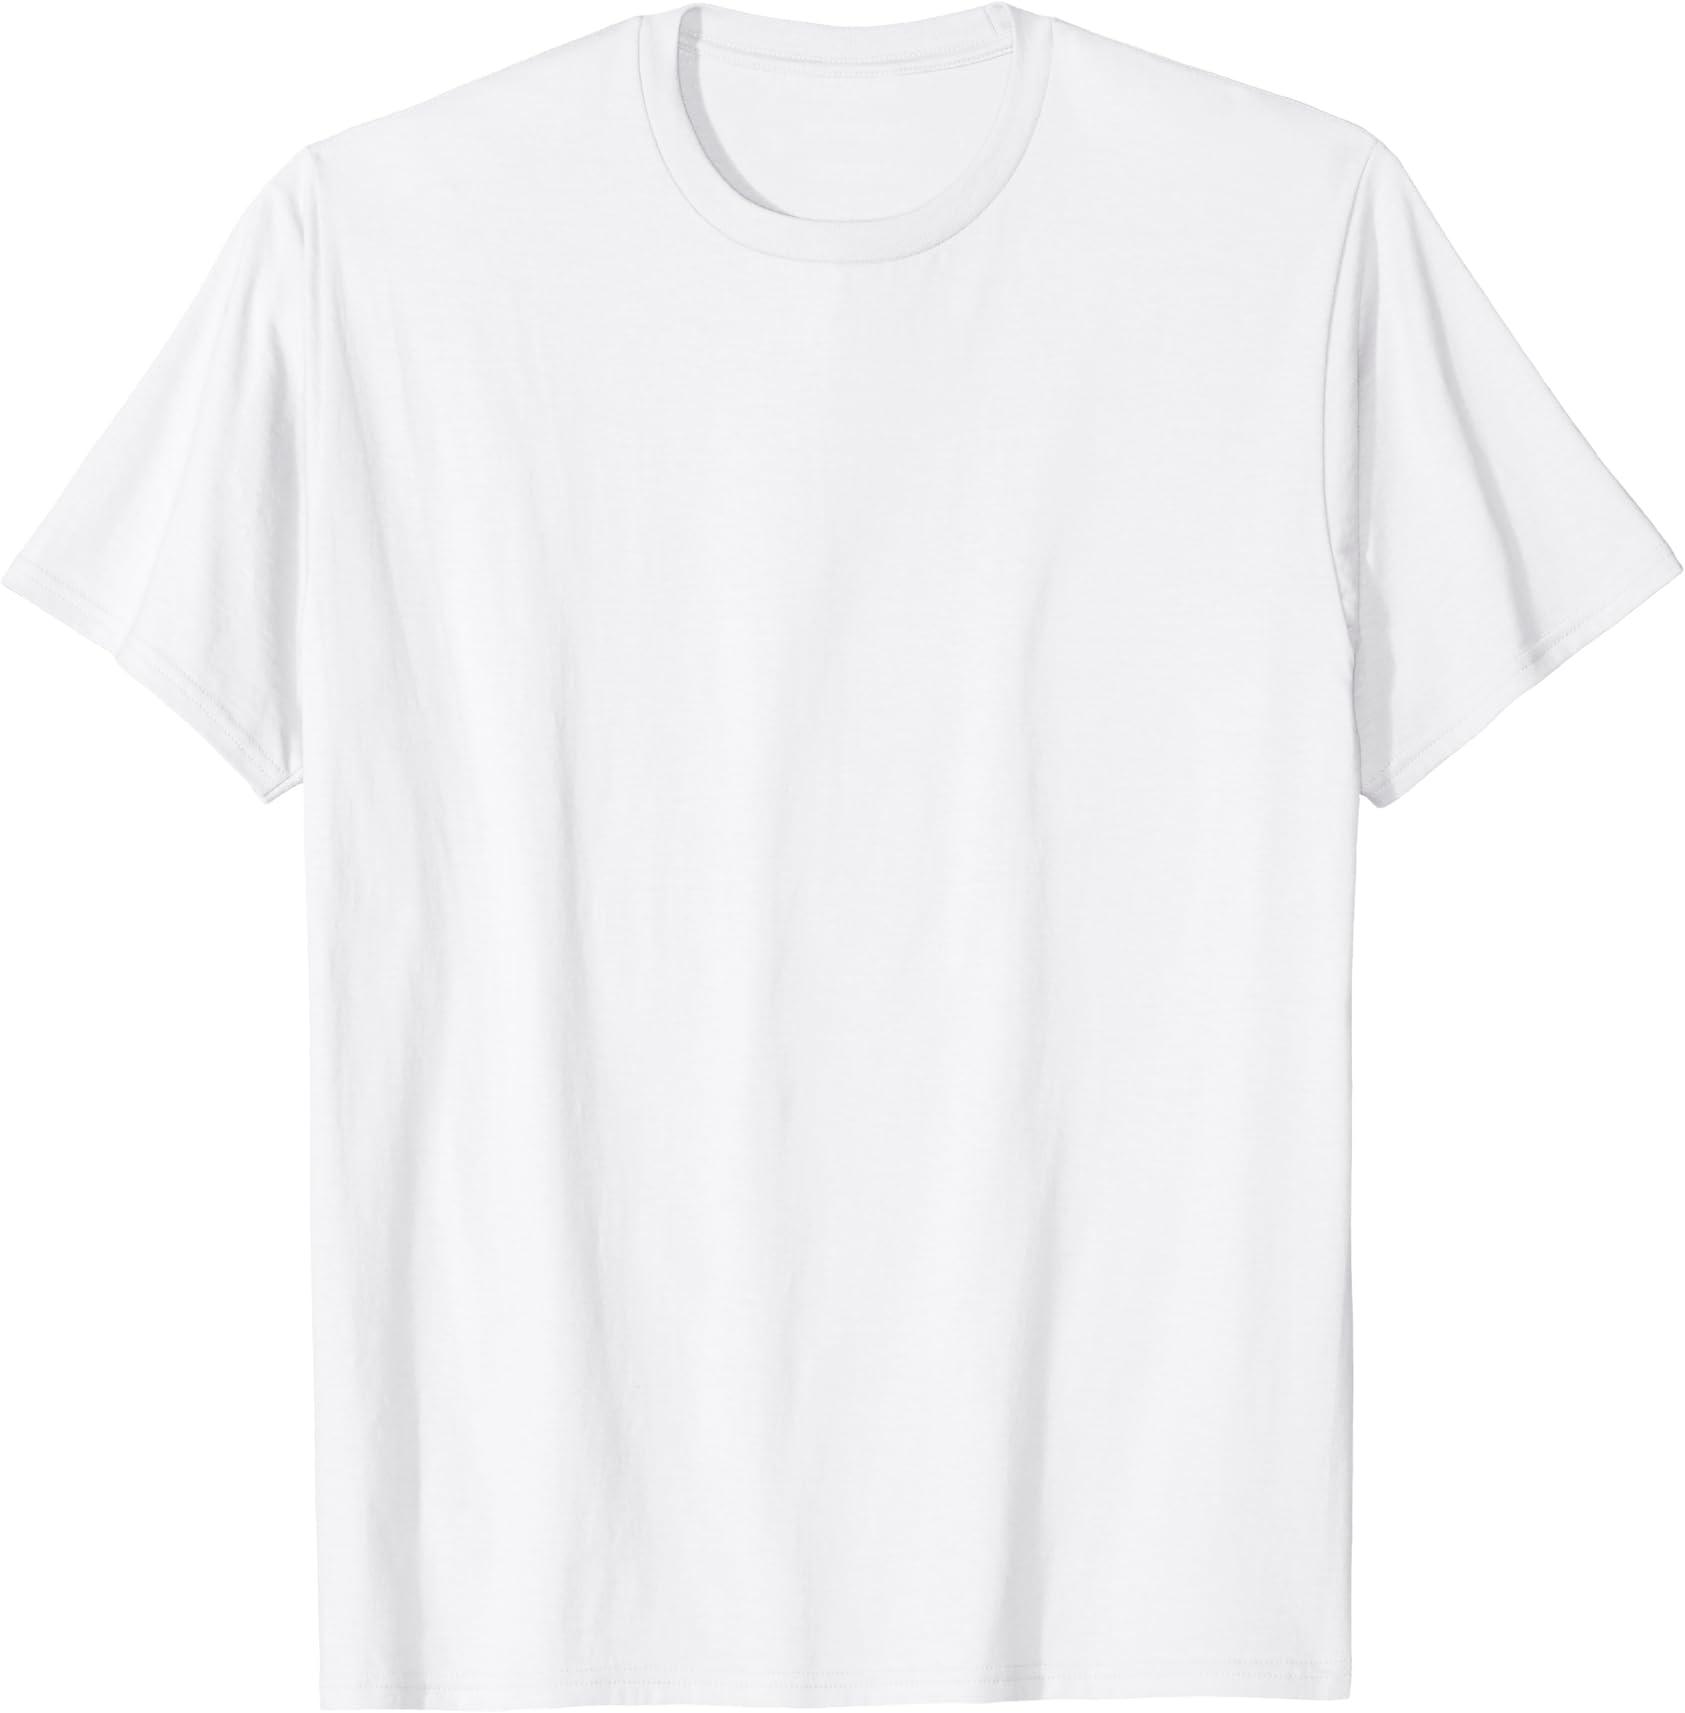 Funny Humor T-Shirt Got Pickle